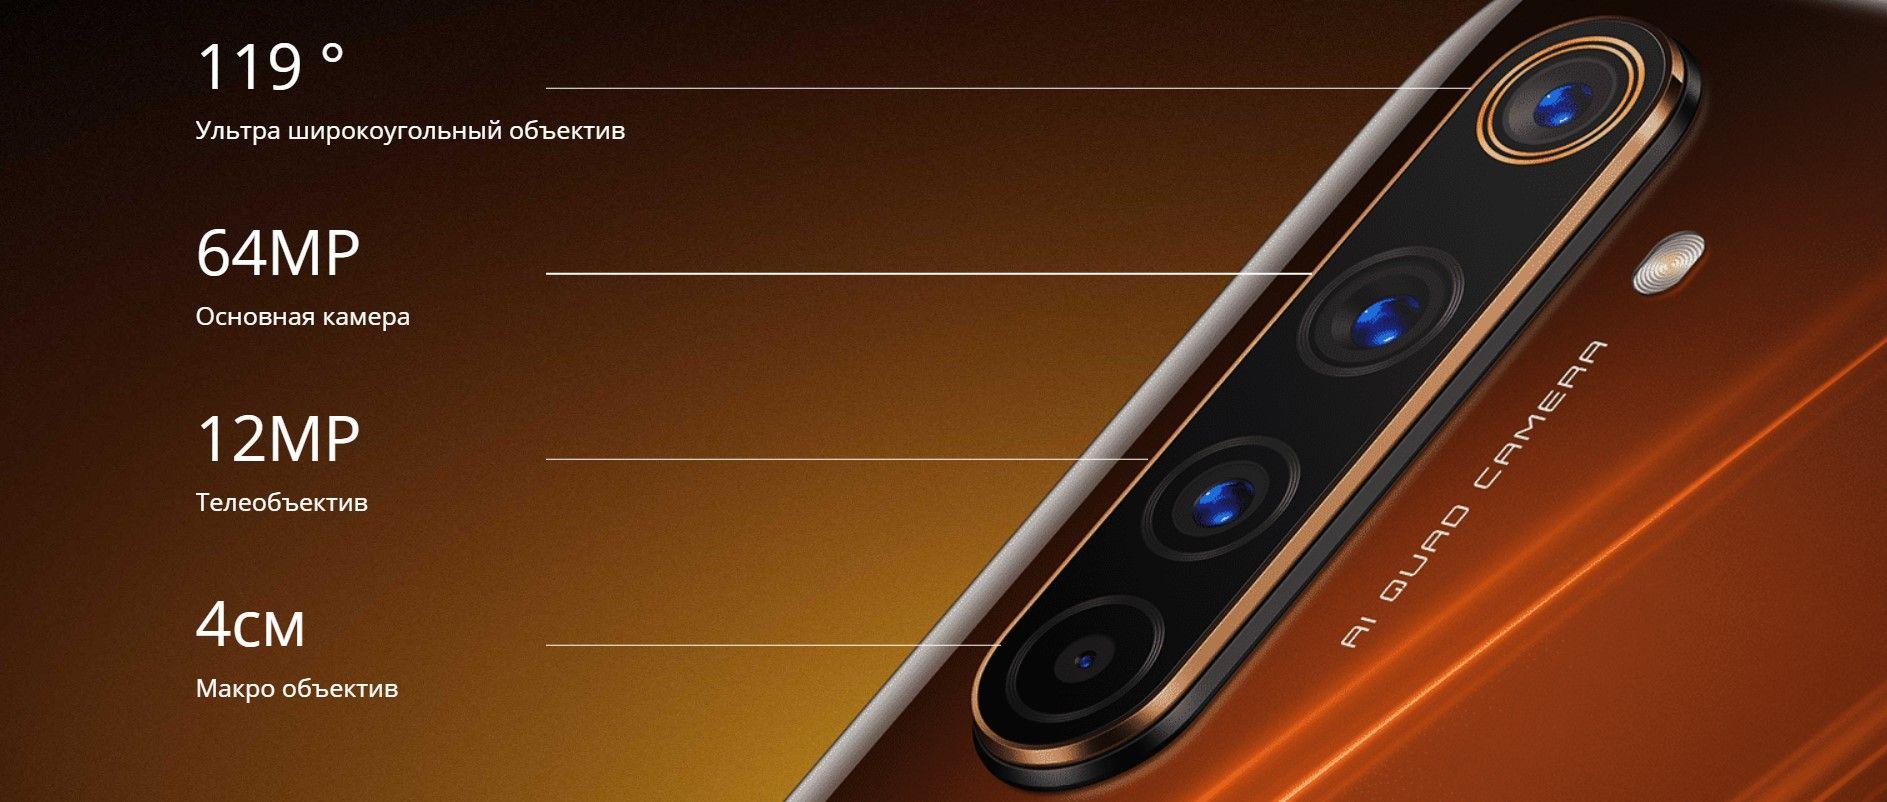 Realme 6 Pro основная камера